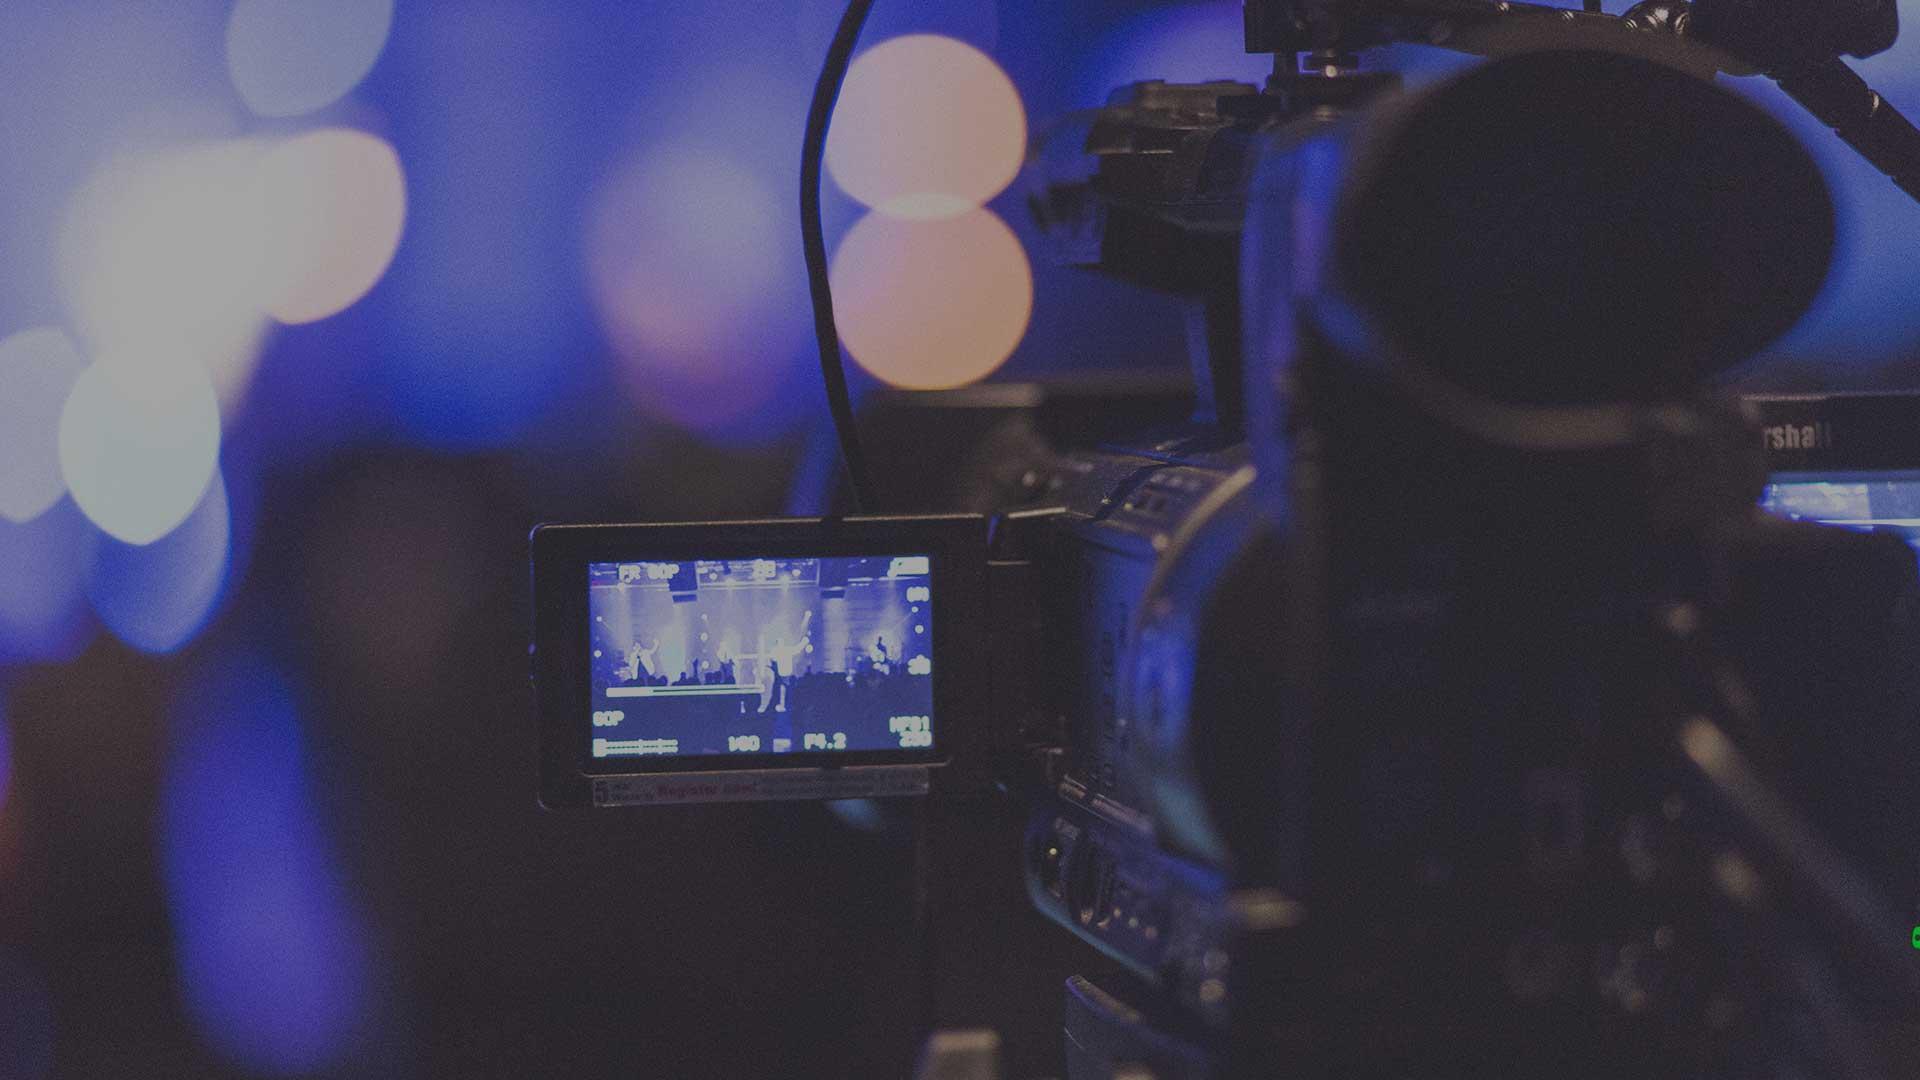 Livestream company in Lagos